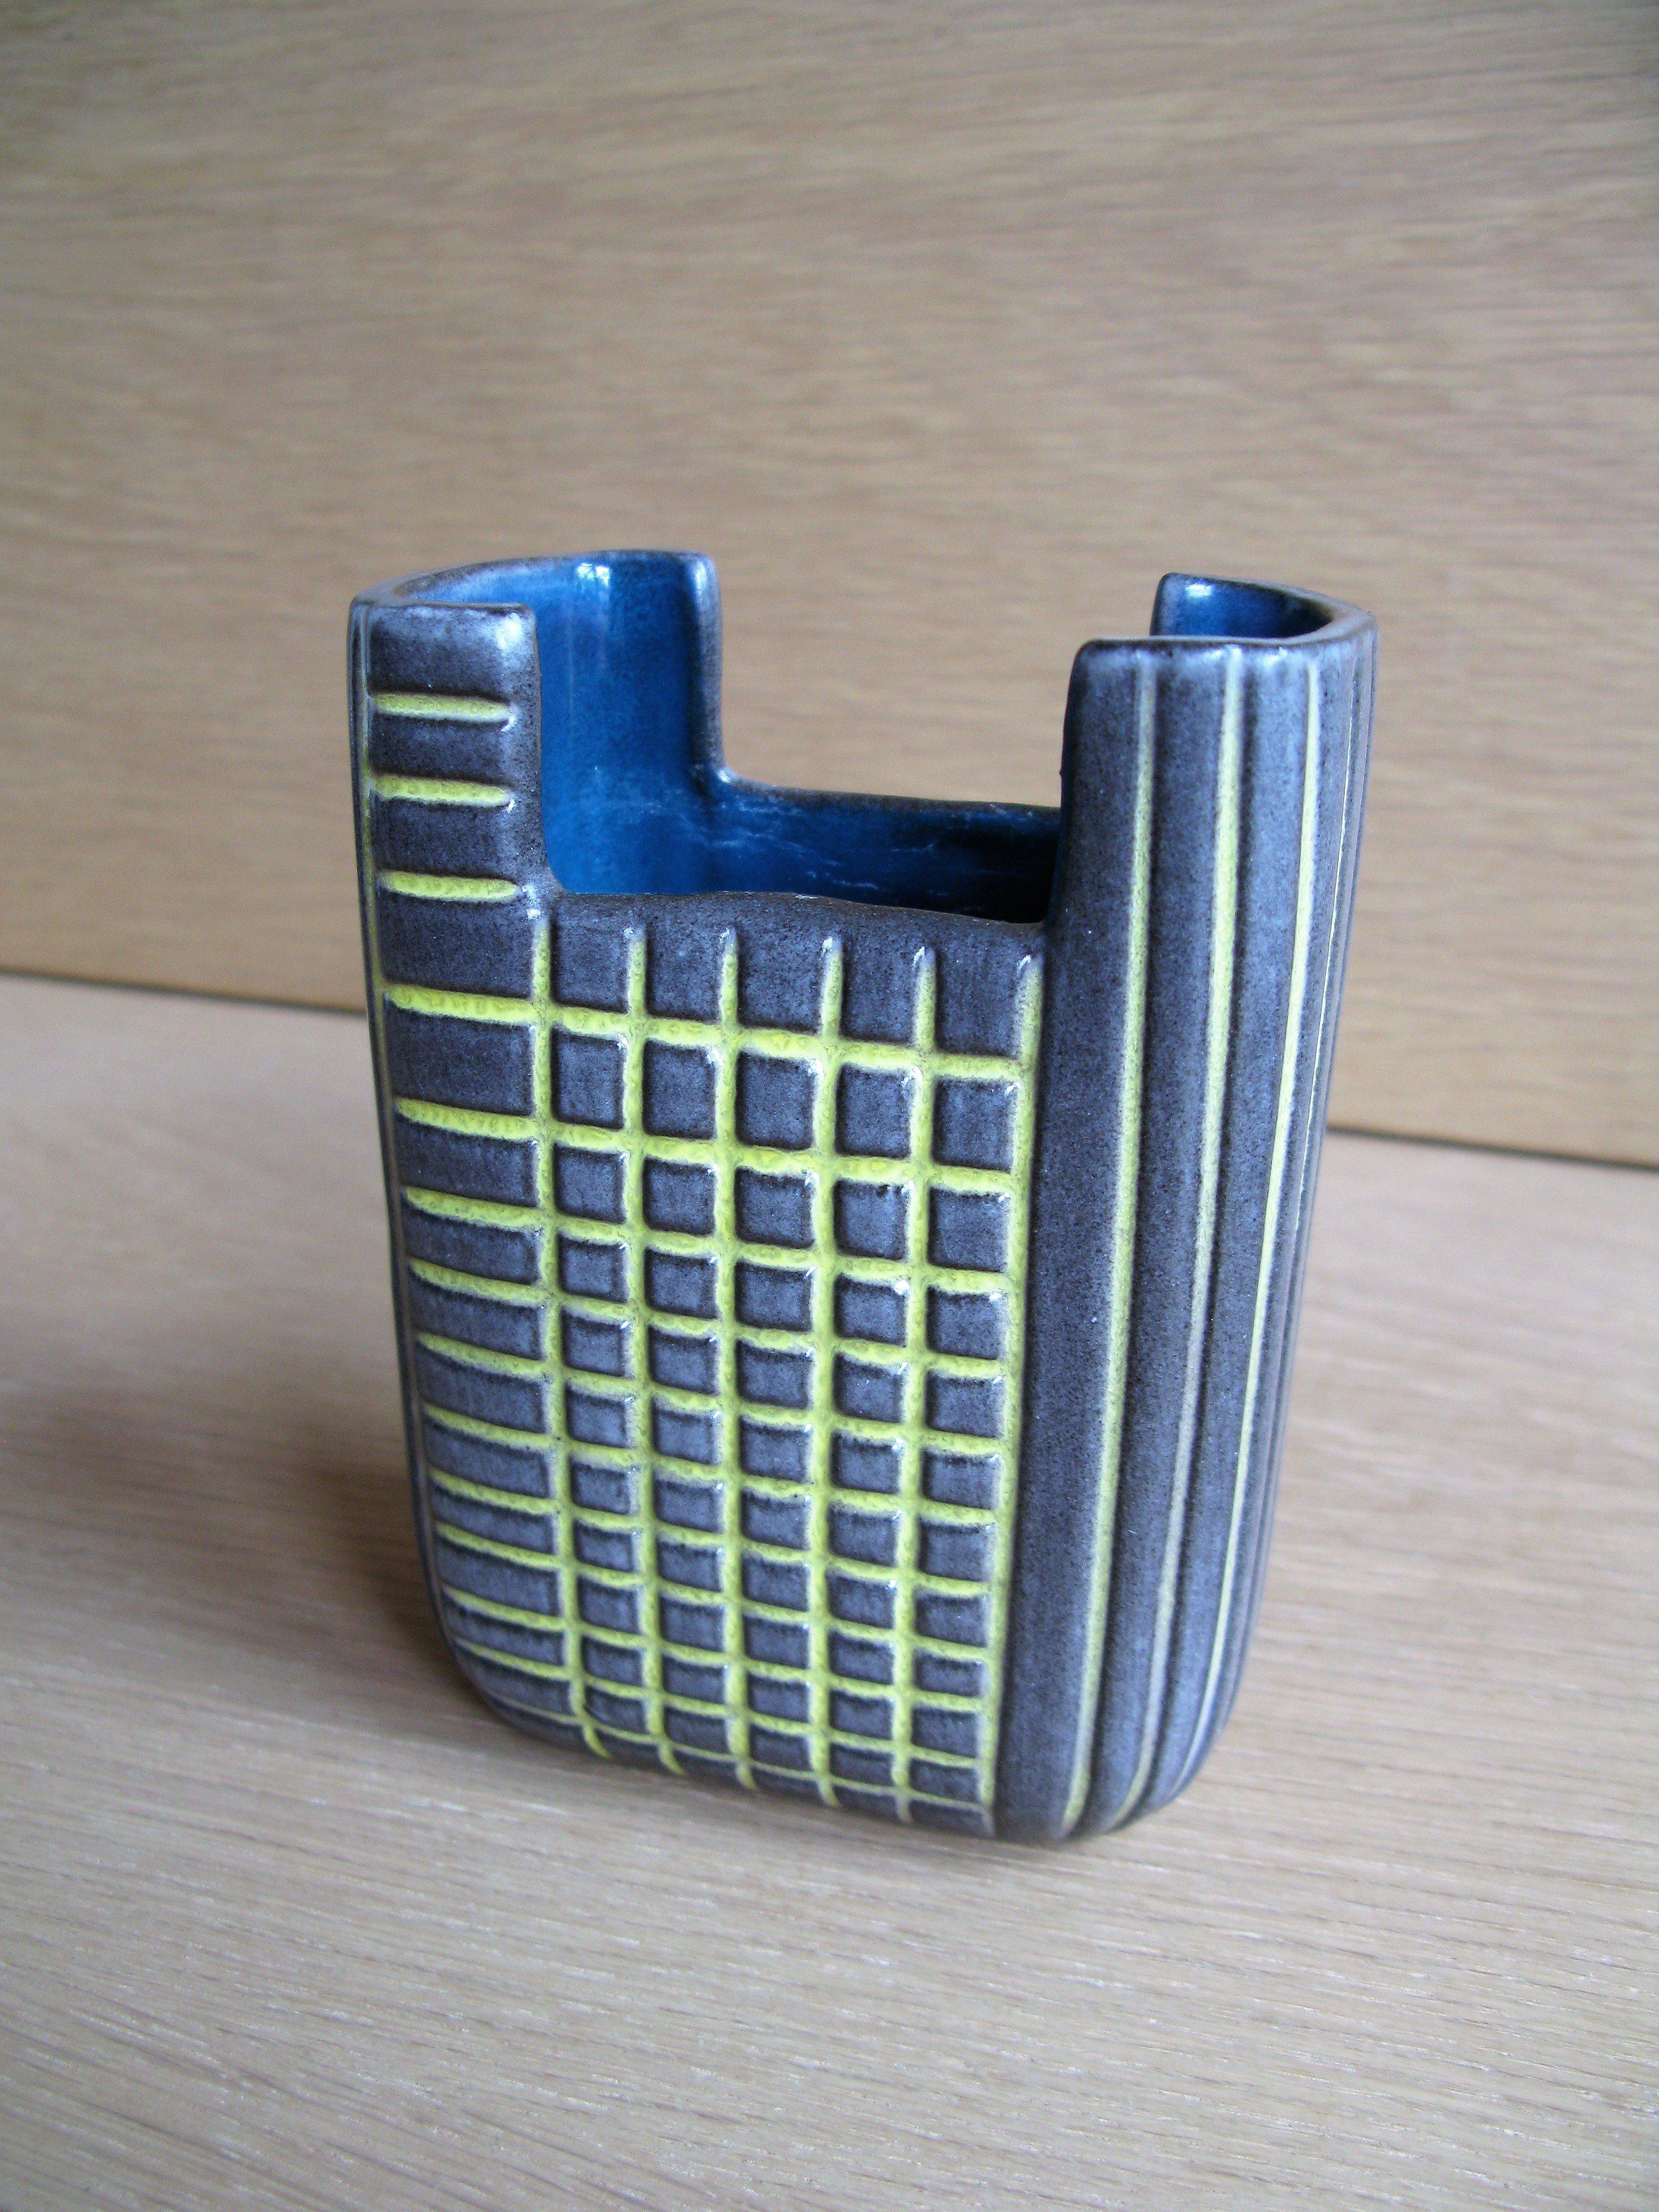 edfu vase 5252 sold